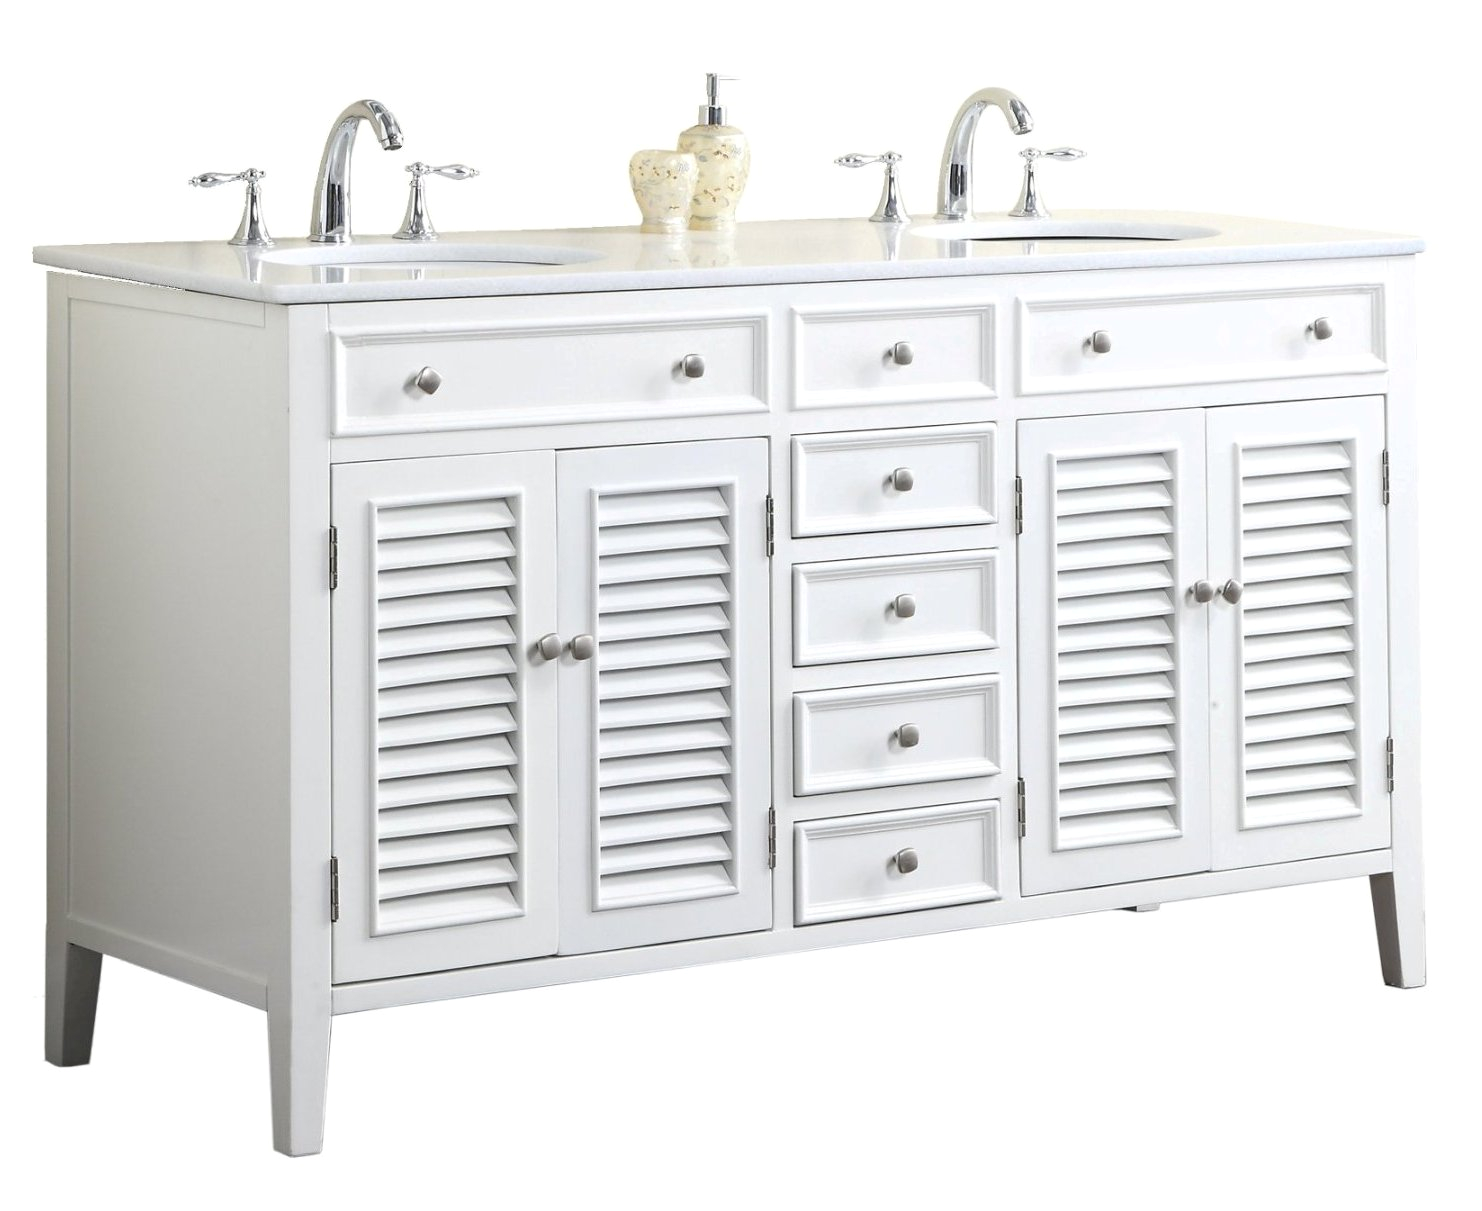 54 Inch Bathroom Vanity Base Bathroom Exciting 60 Inch Vanity Double Sink for Modern